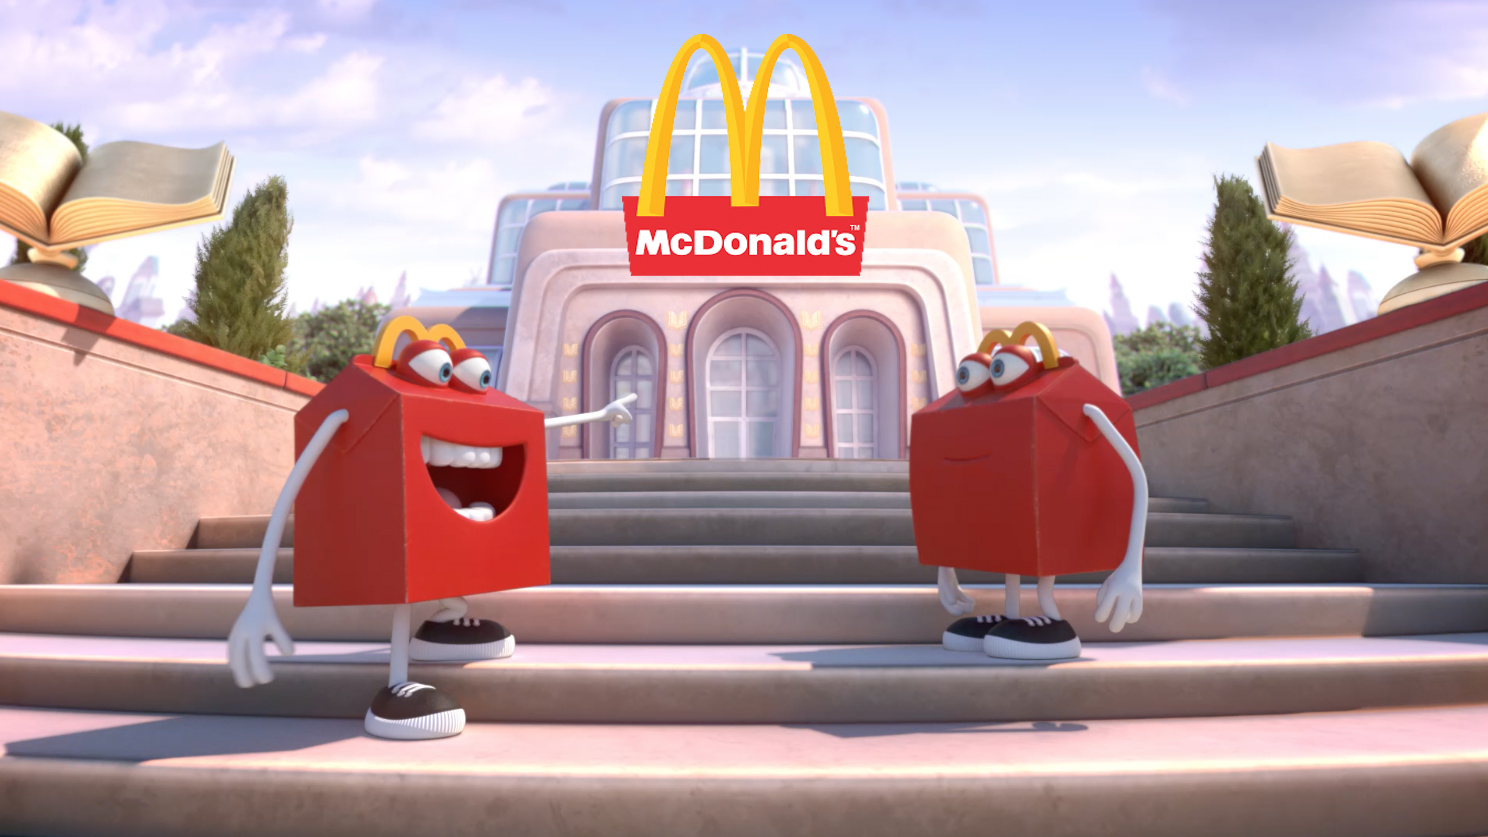 mcdonalds logo petersluszka